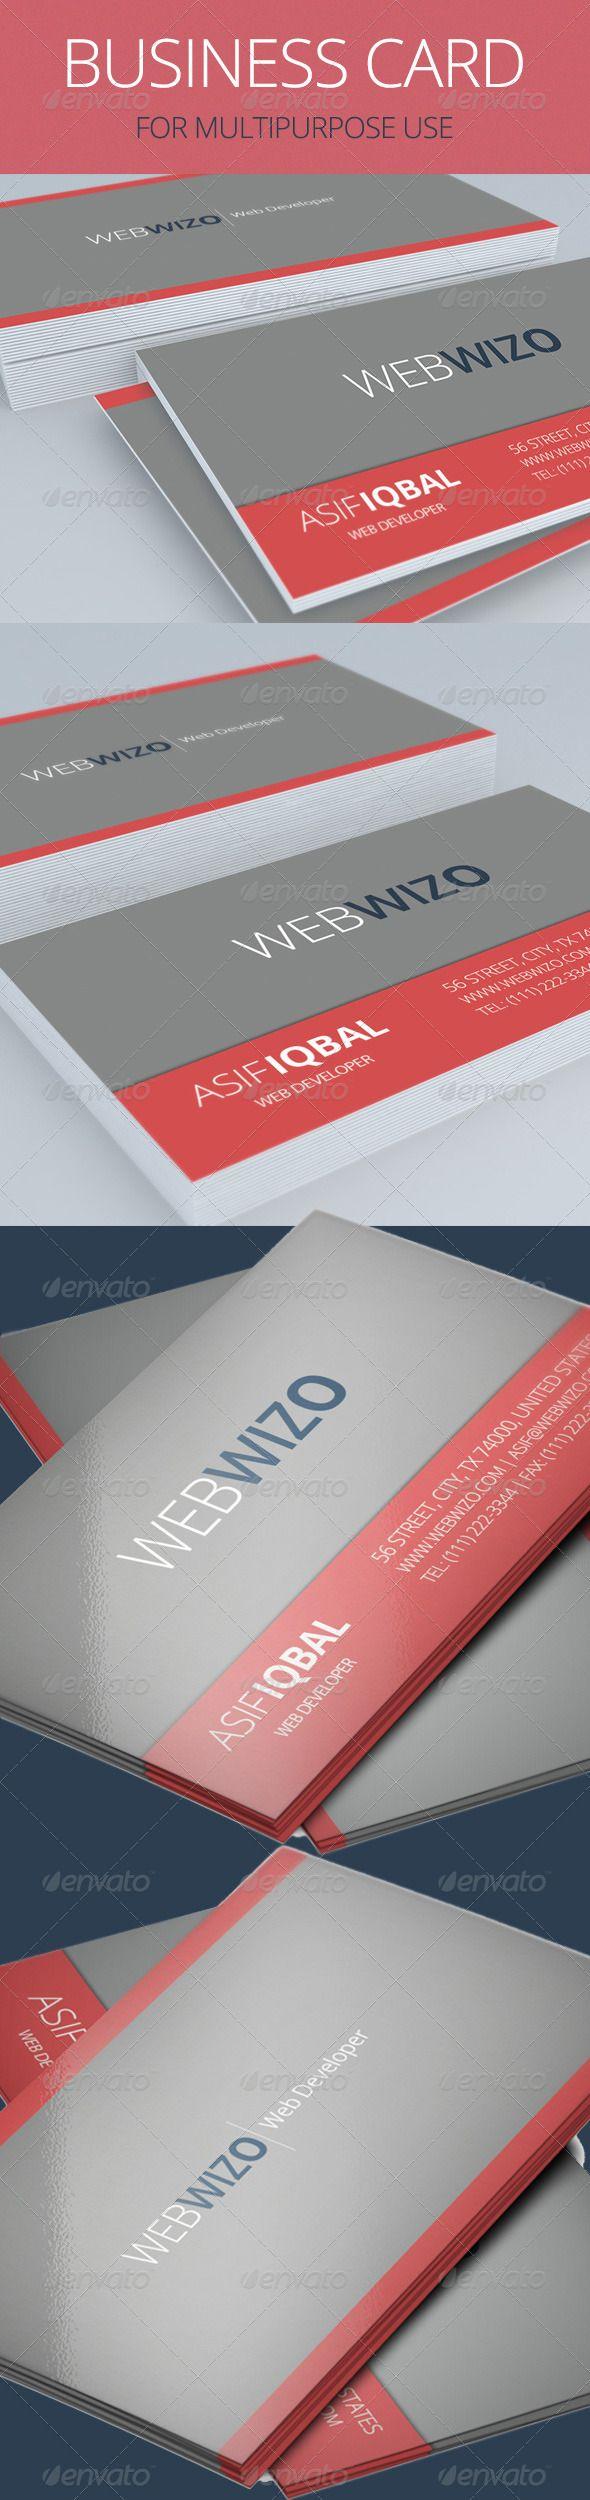 Best 25 business card software ideas on pinterest business card multipurpose business card magicingreecefo Images